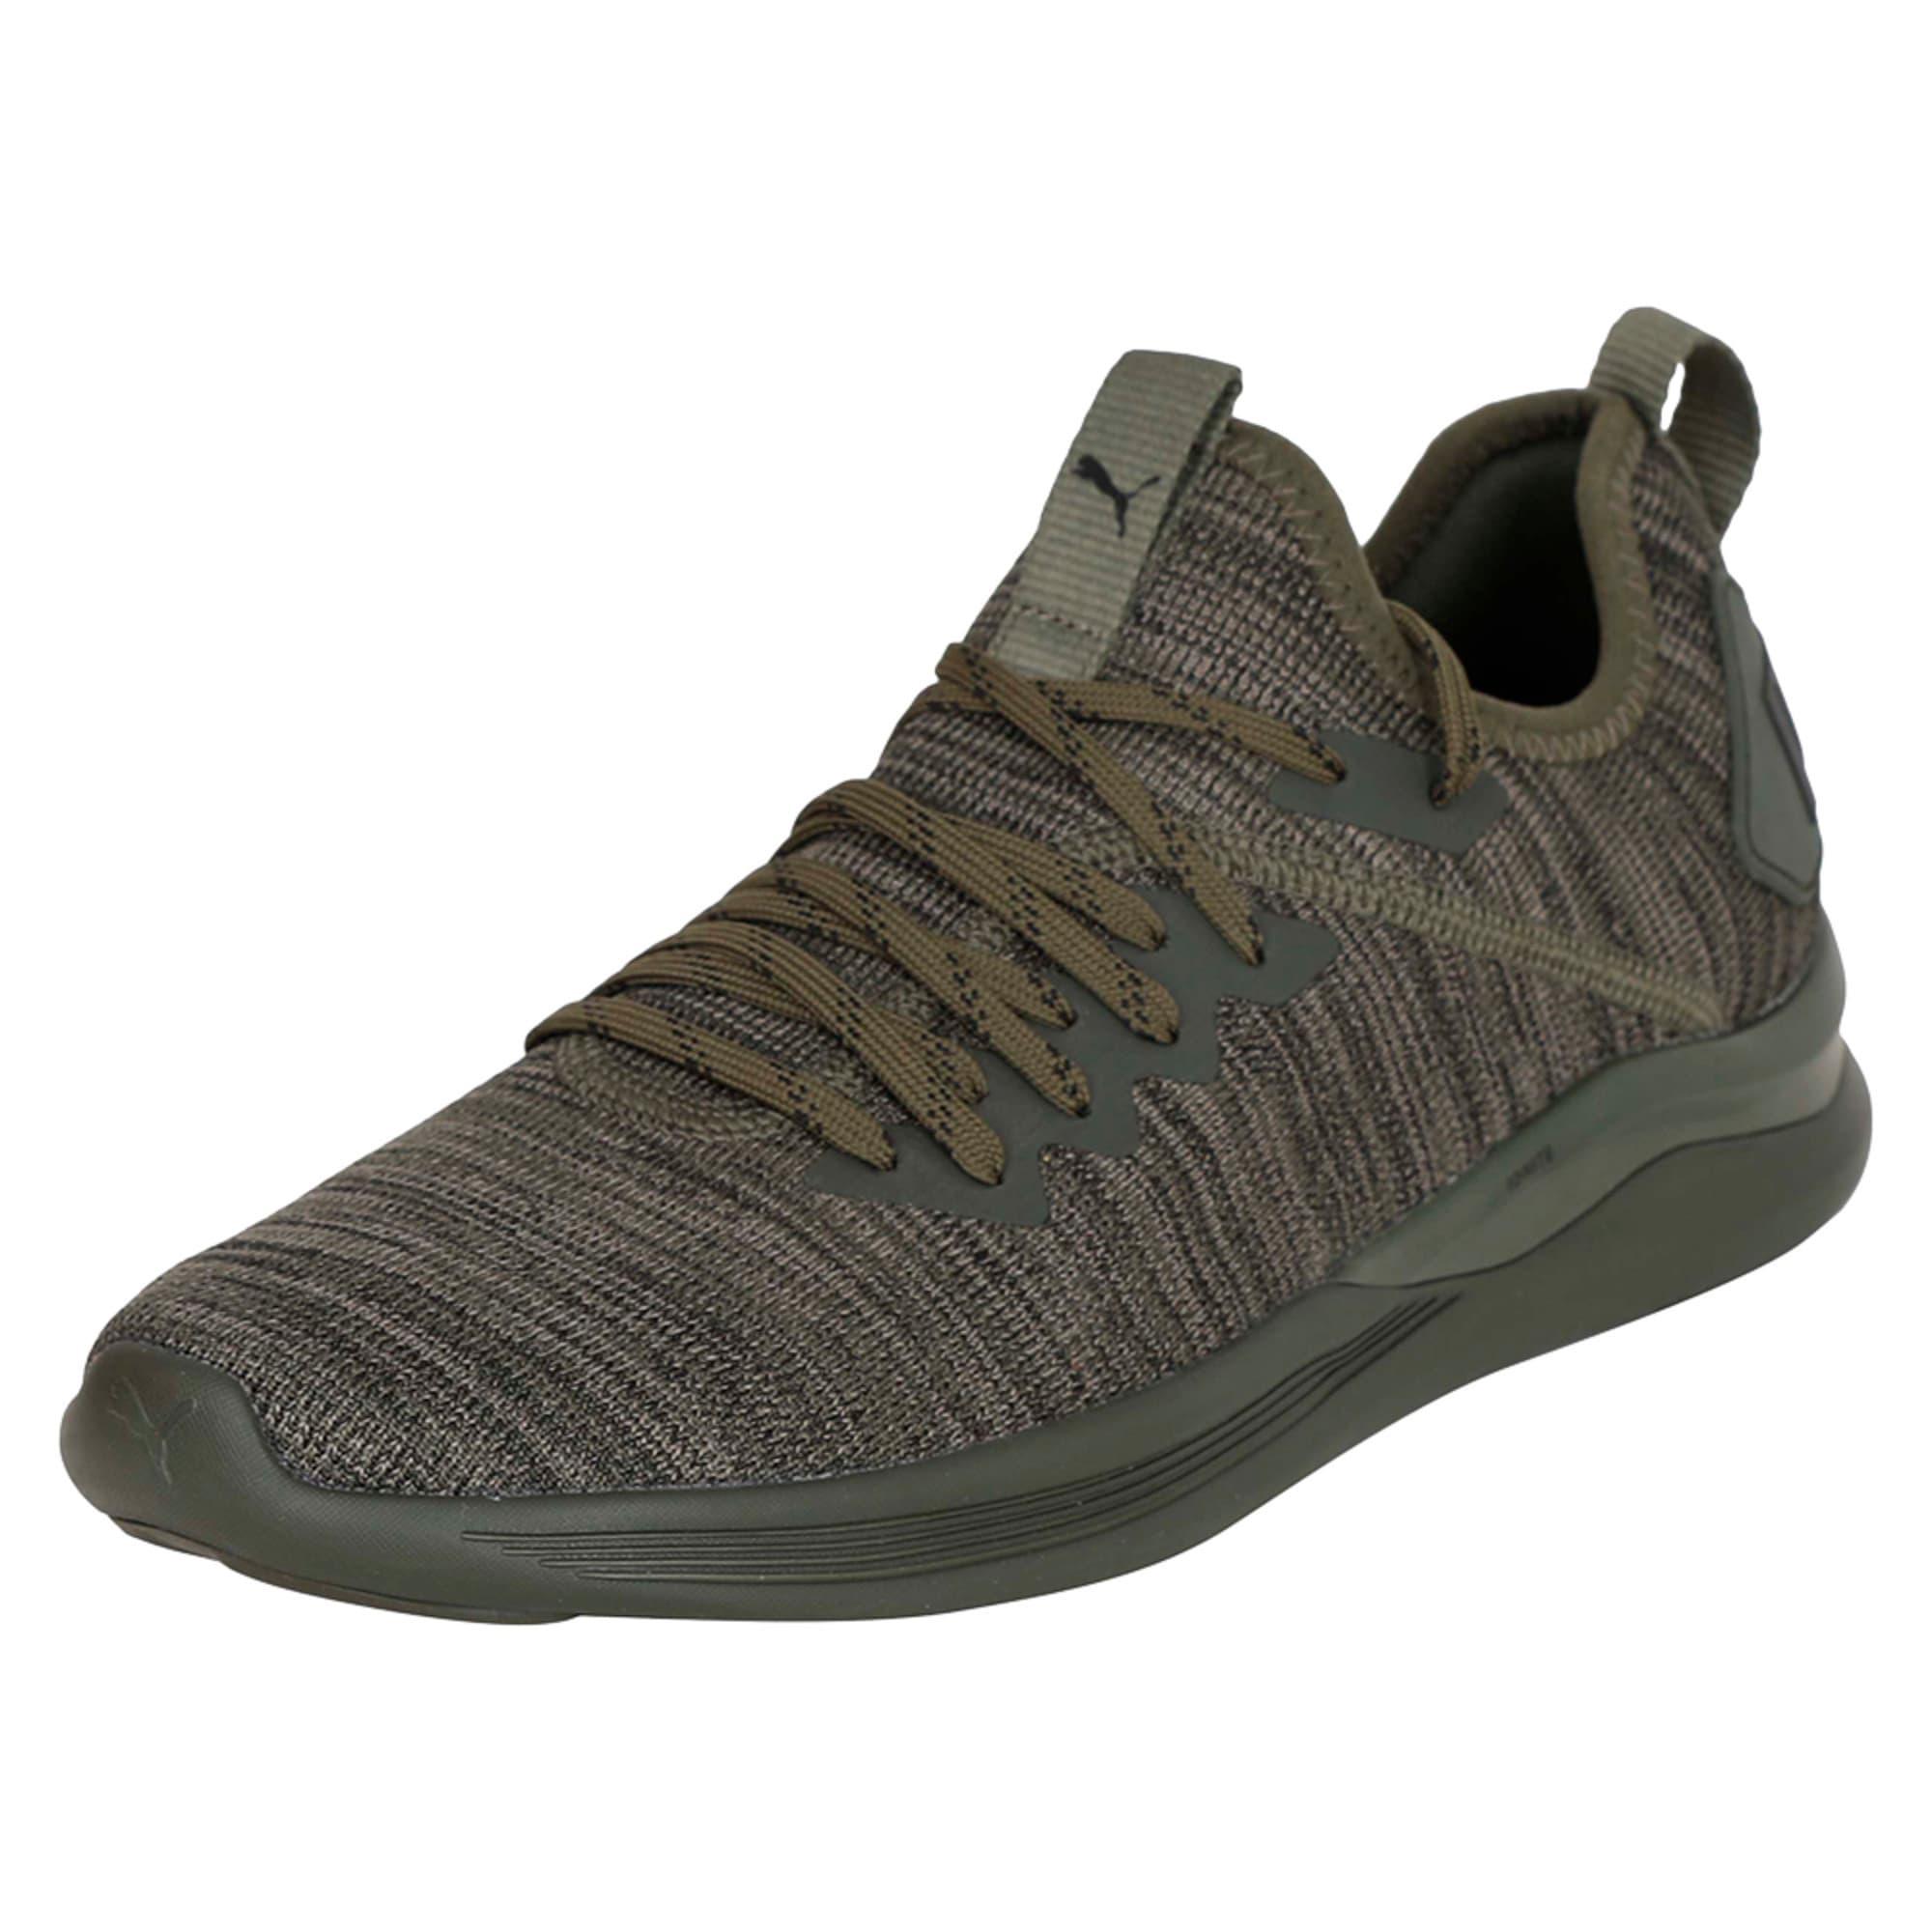 Thumbnail 1 of IGNITE Flash evoKNIT Men's Training Shoes, Forest Night-Gray-Black, medium-IND